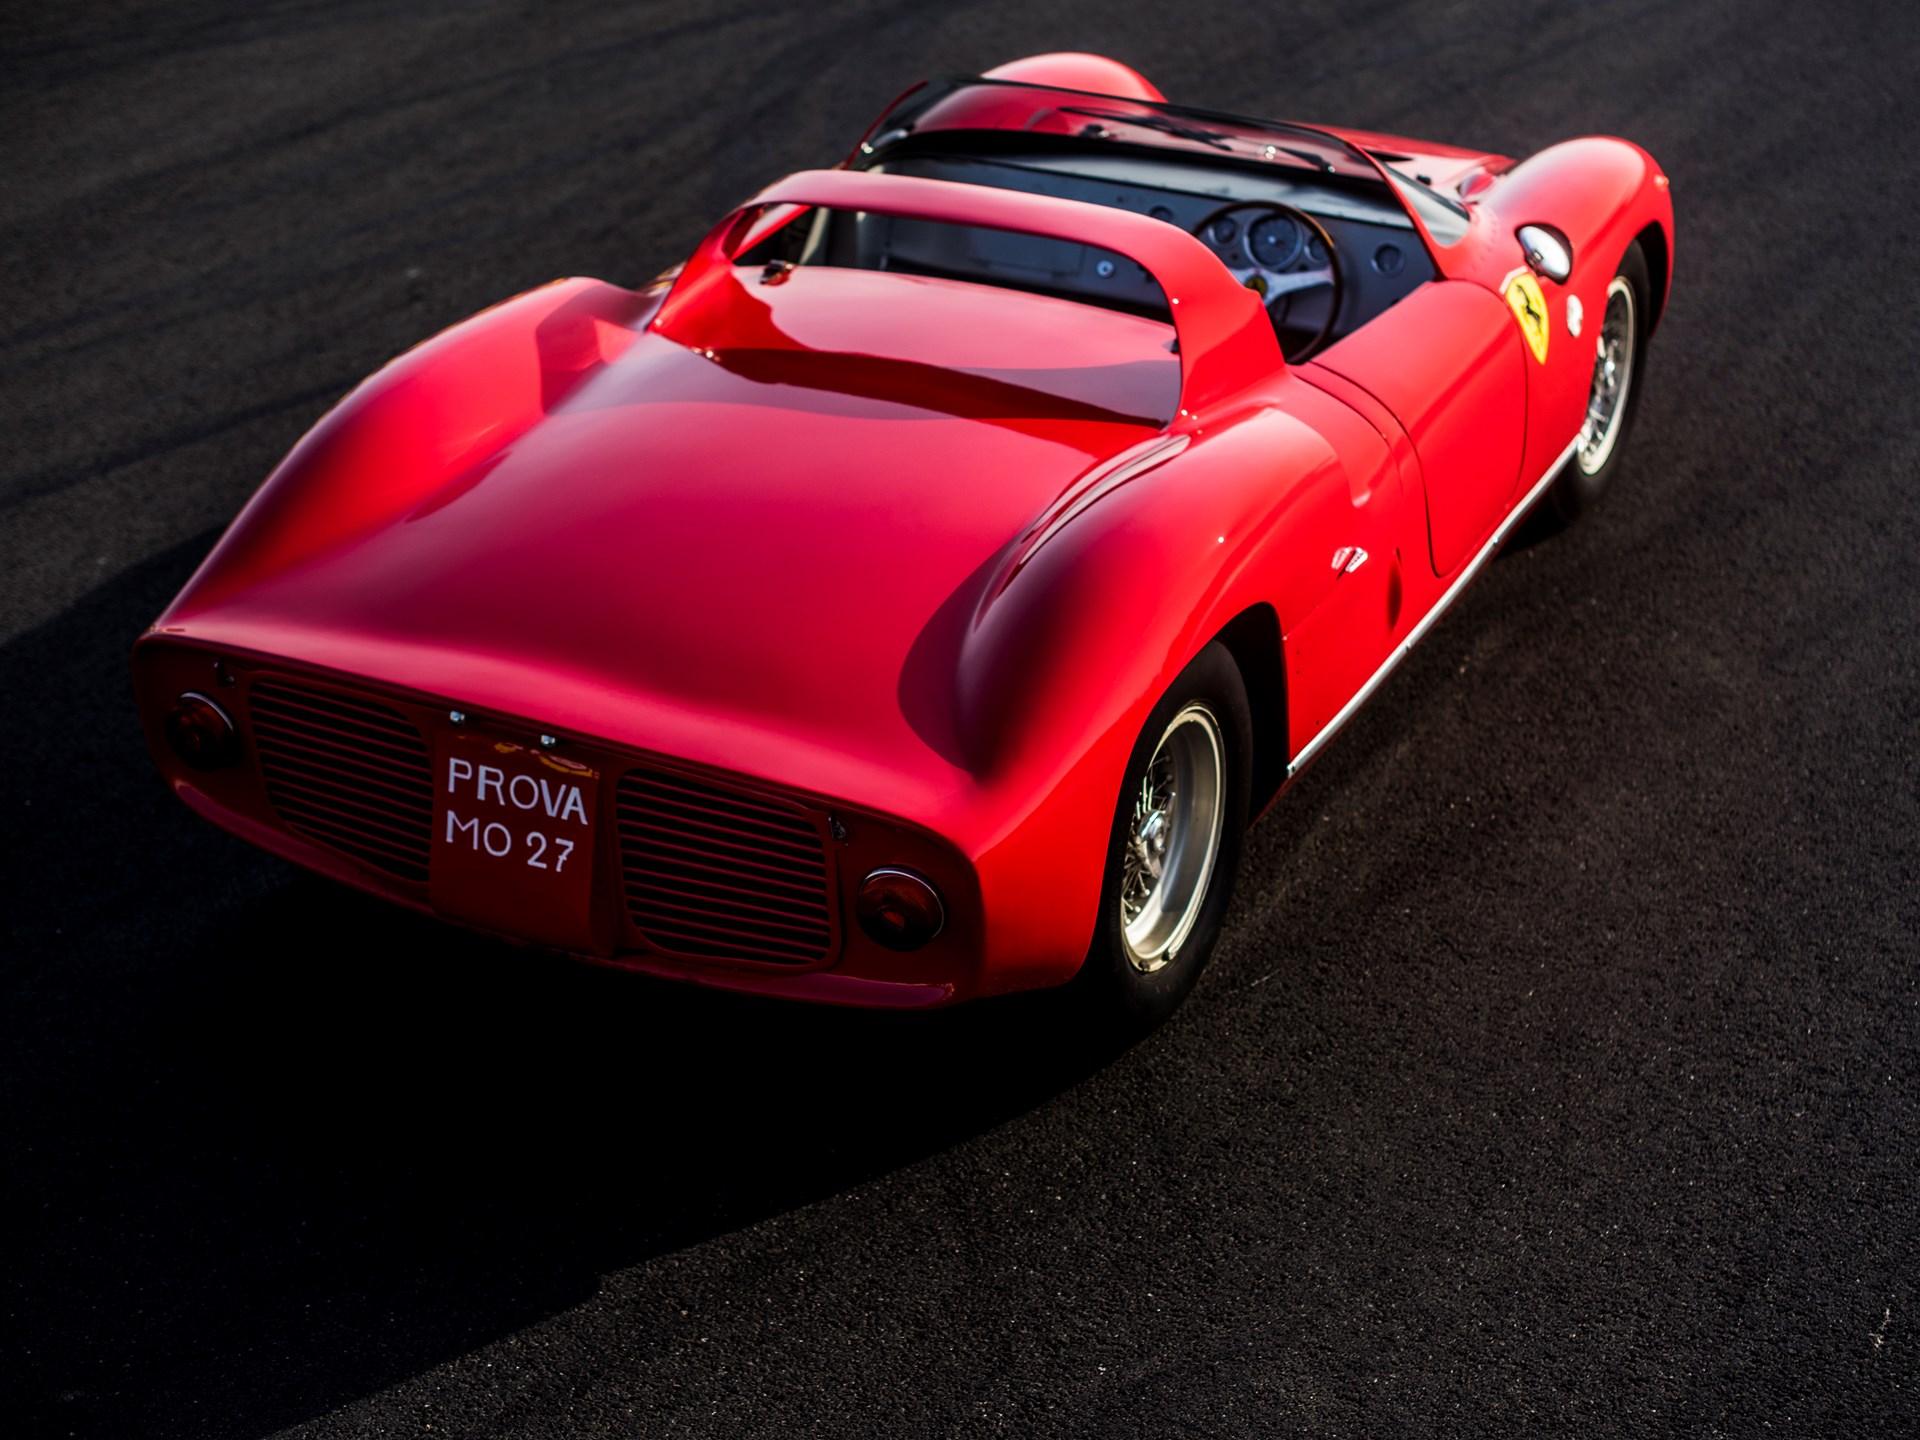 1963 Ferrari 275P rear 3/4